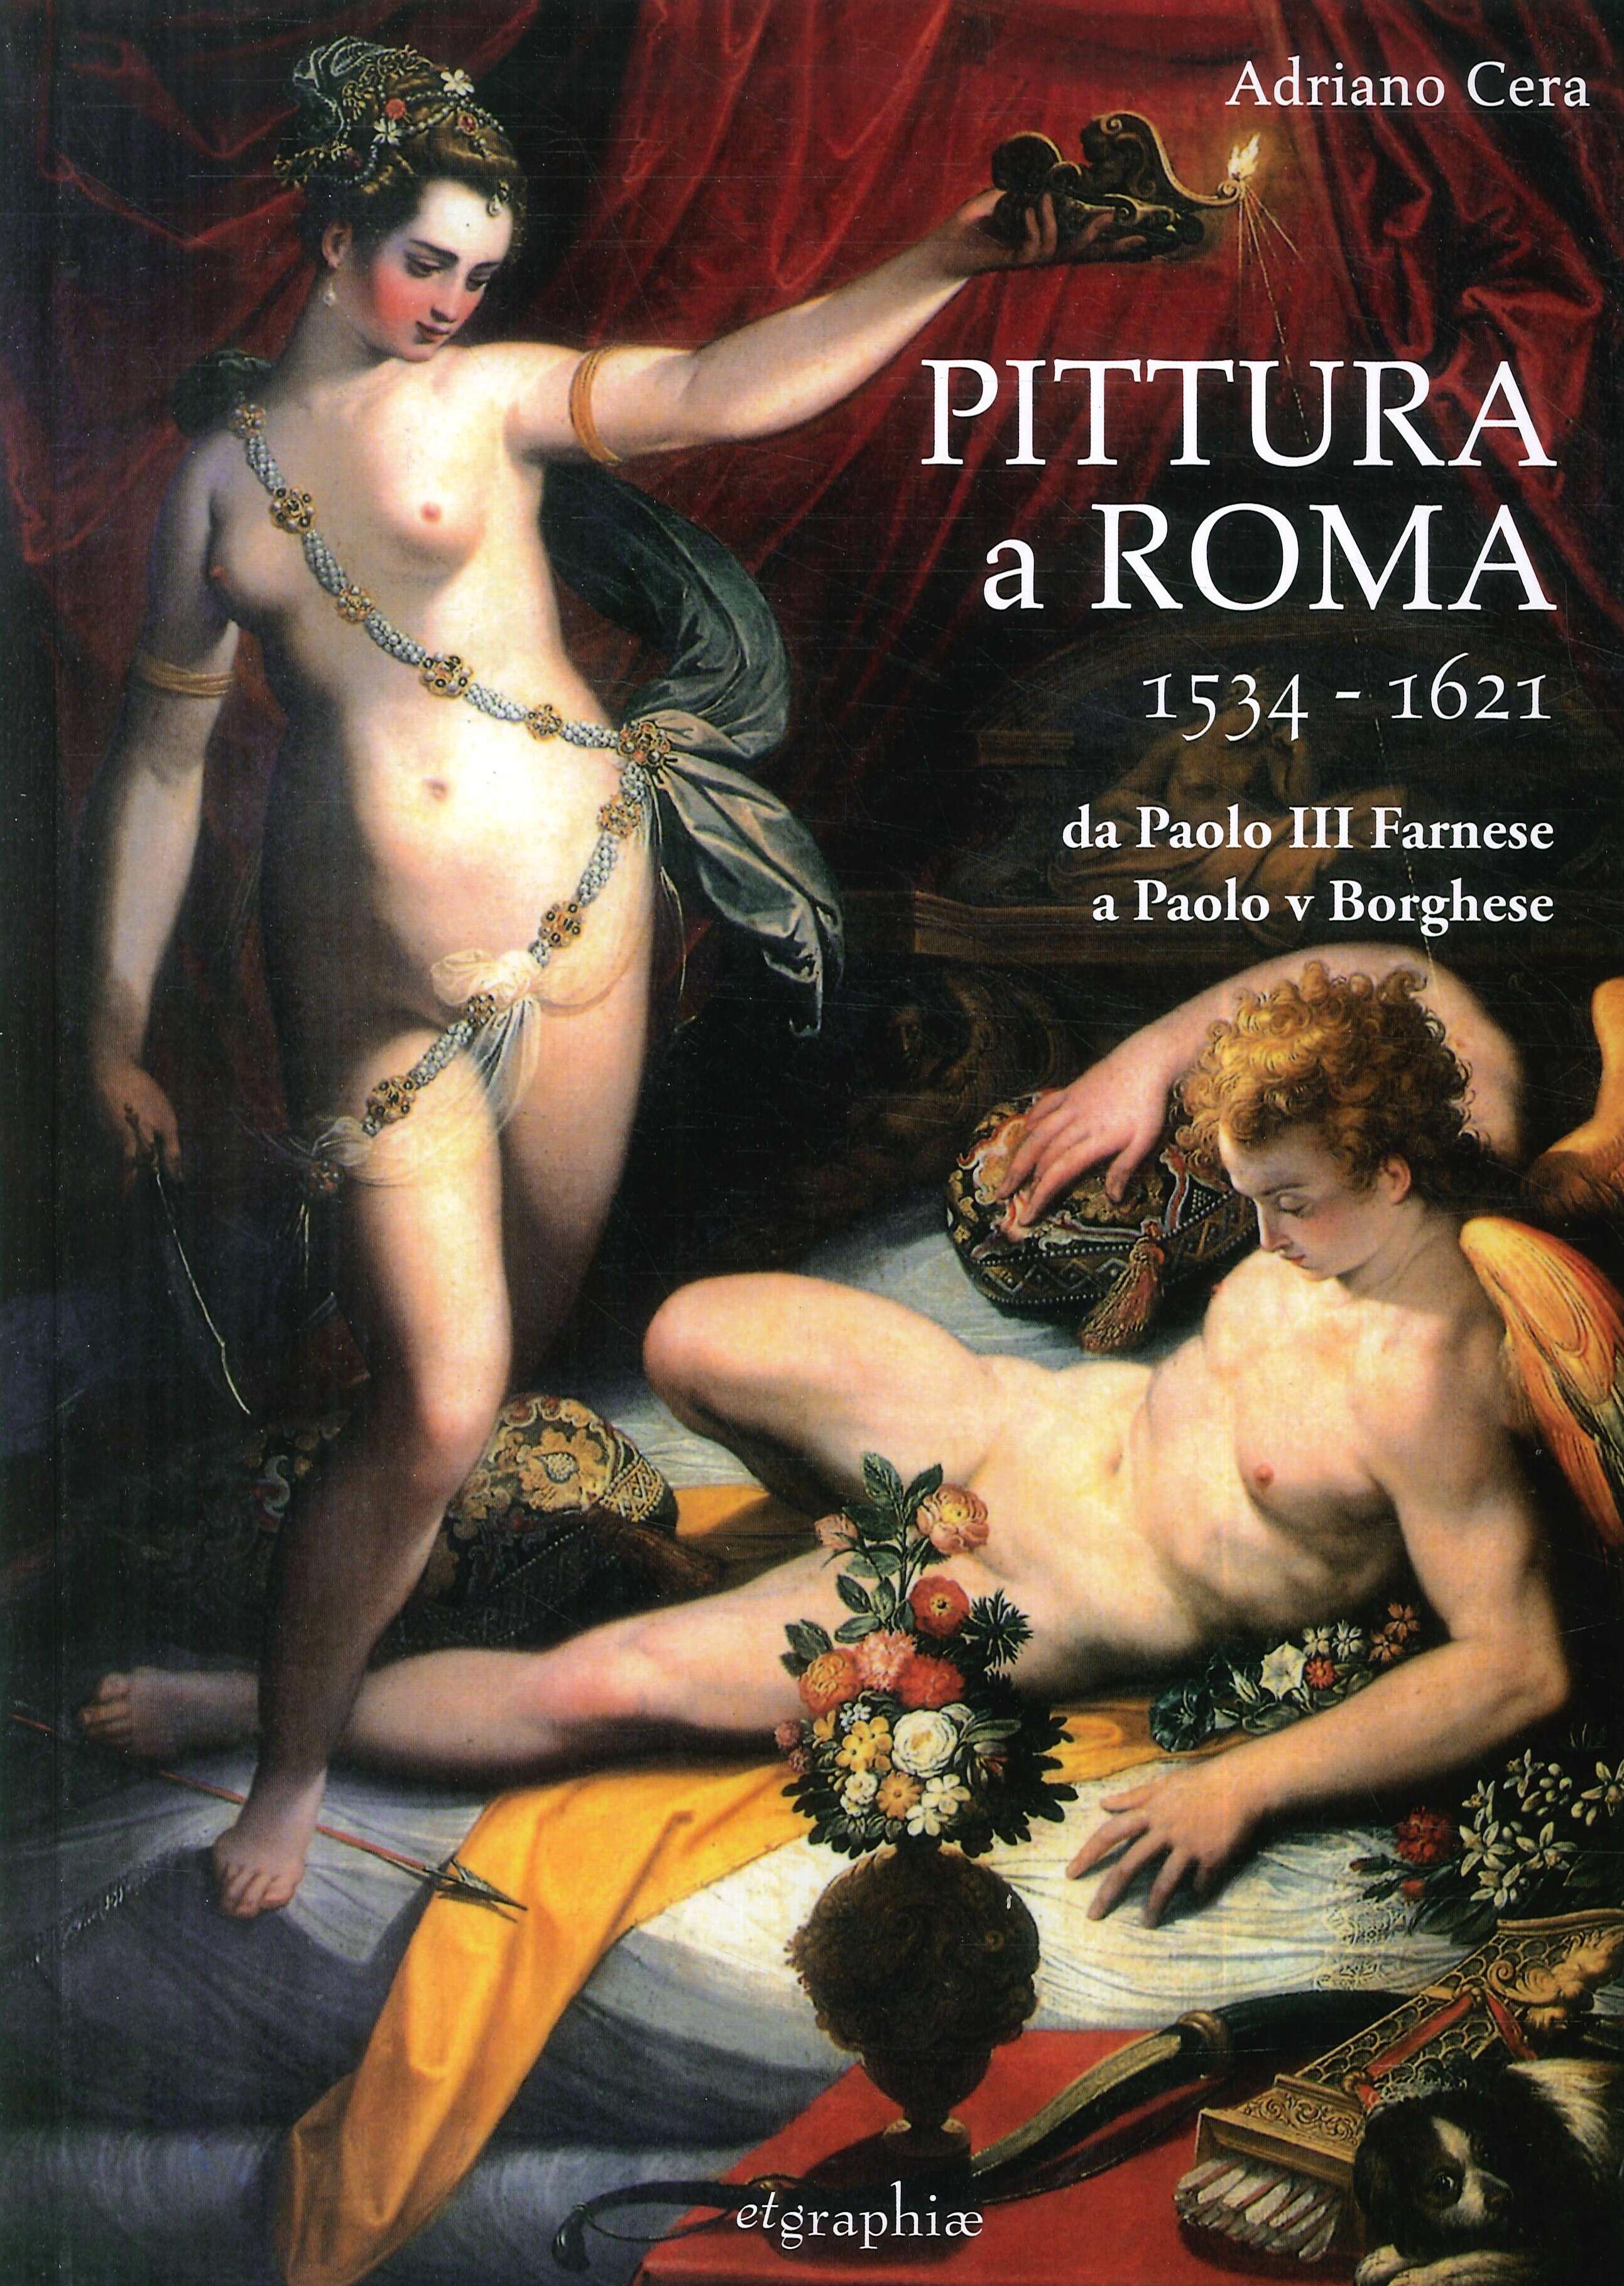 Pittura a Roma 1534-1621. Da Paolo III Farnese a Paolo V Borghese